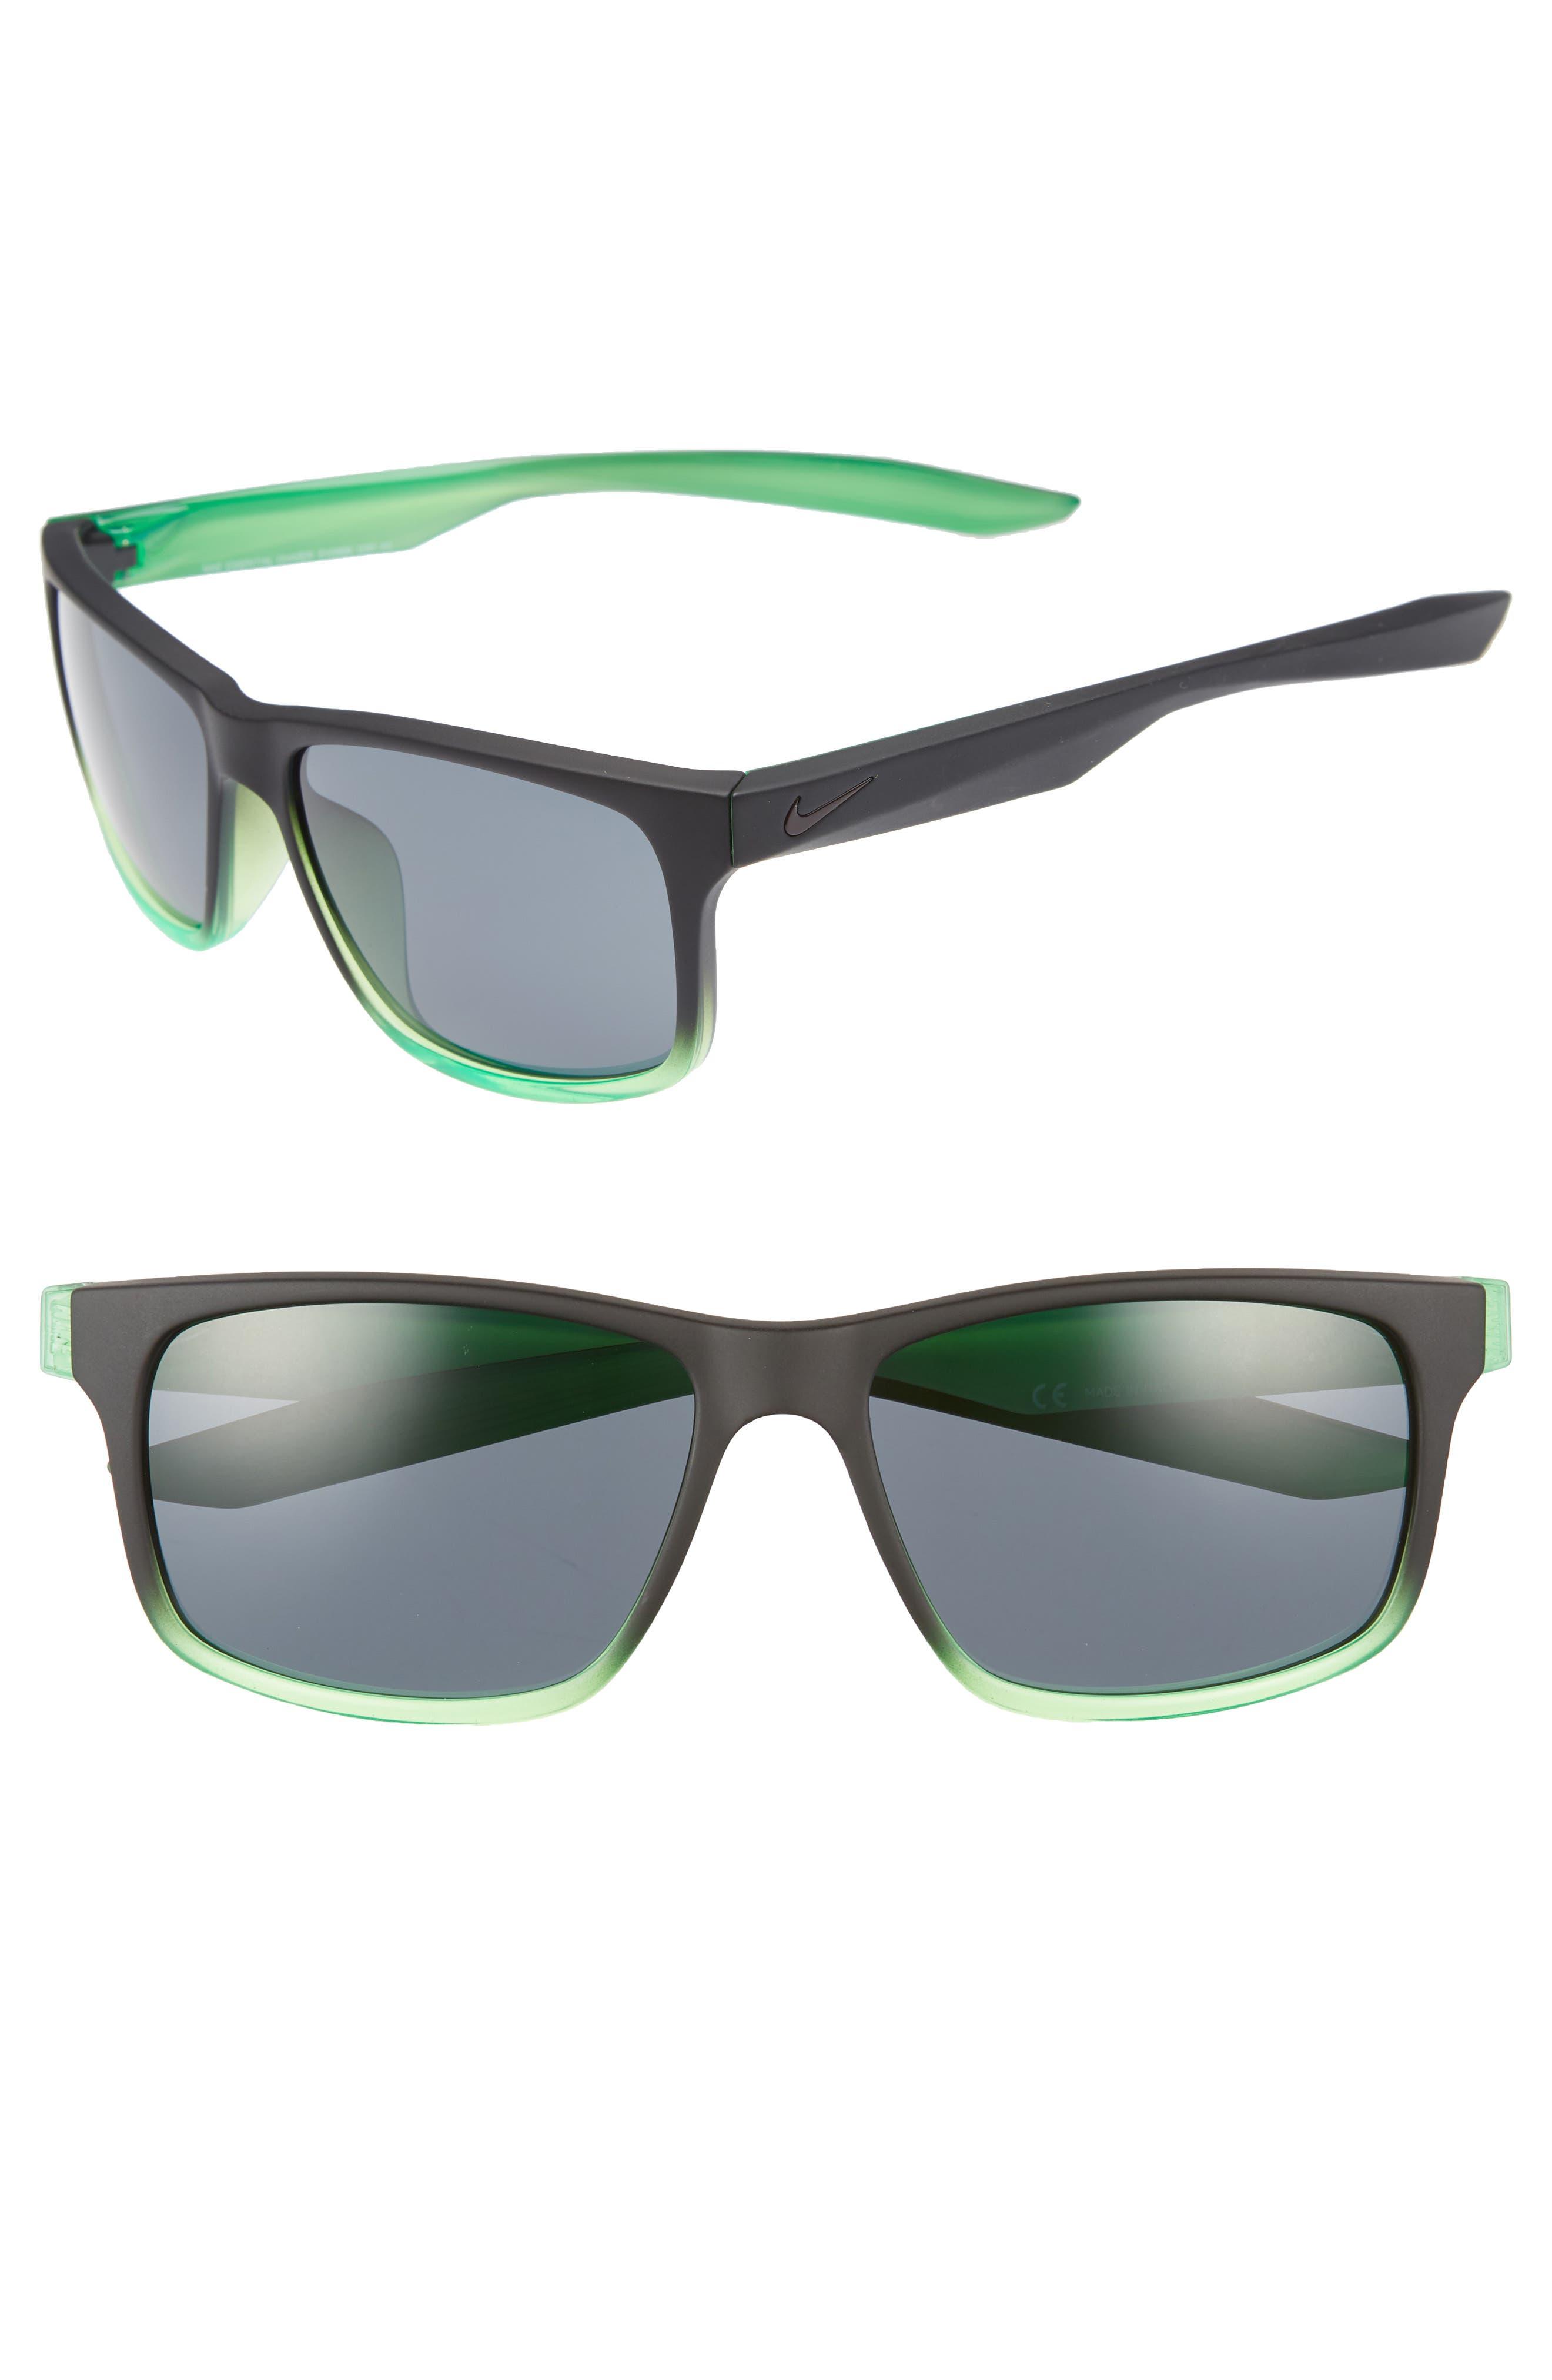 Essential Chaser 56mm Sunglasses,                         Main,                         color, Matte Black Green/ Dark Grey